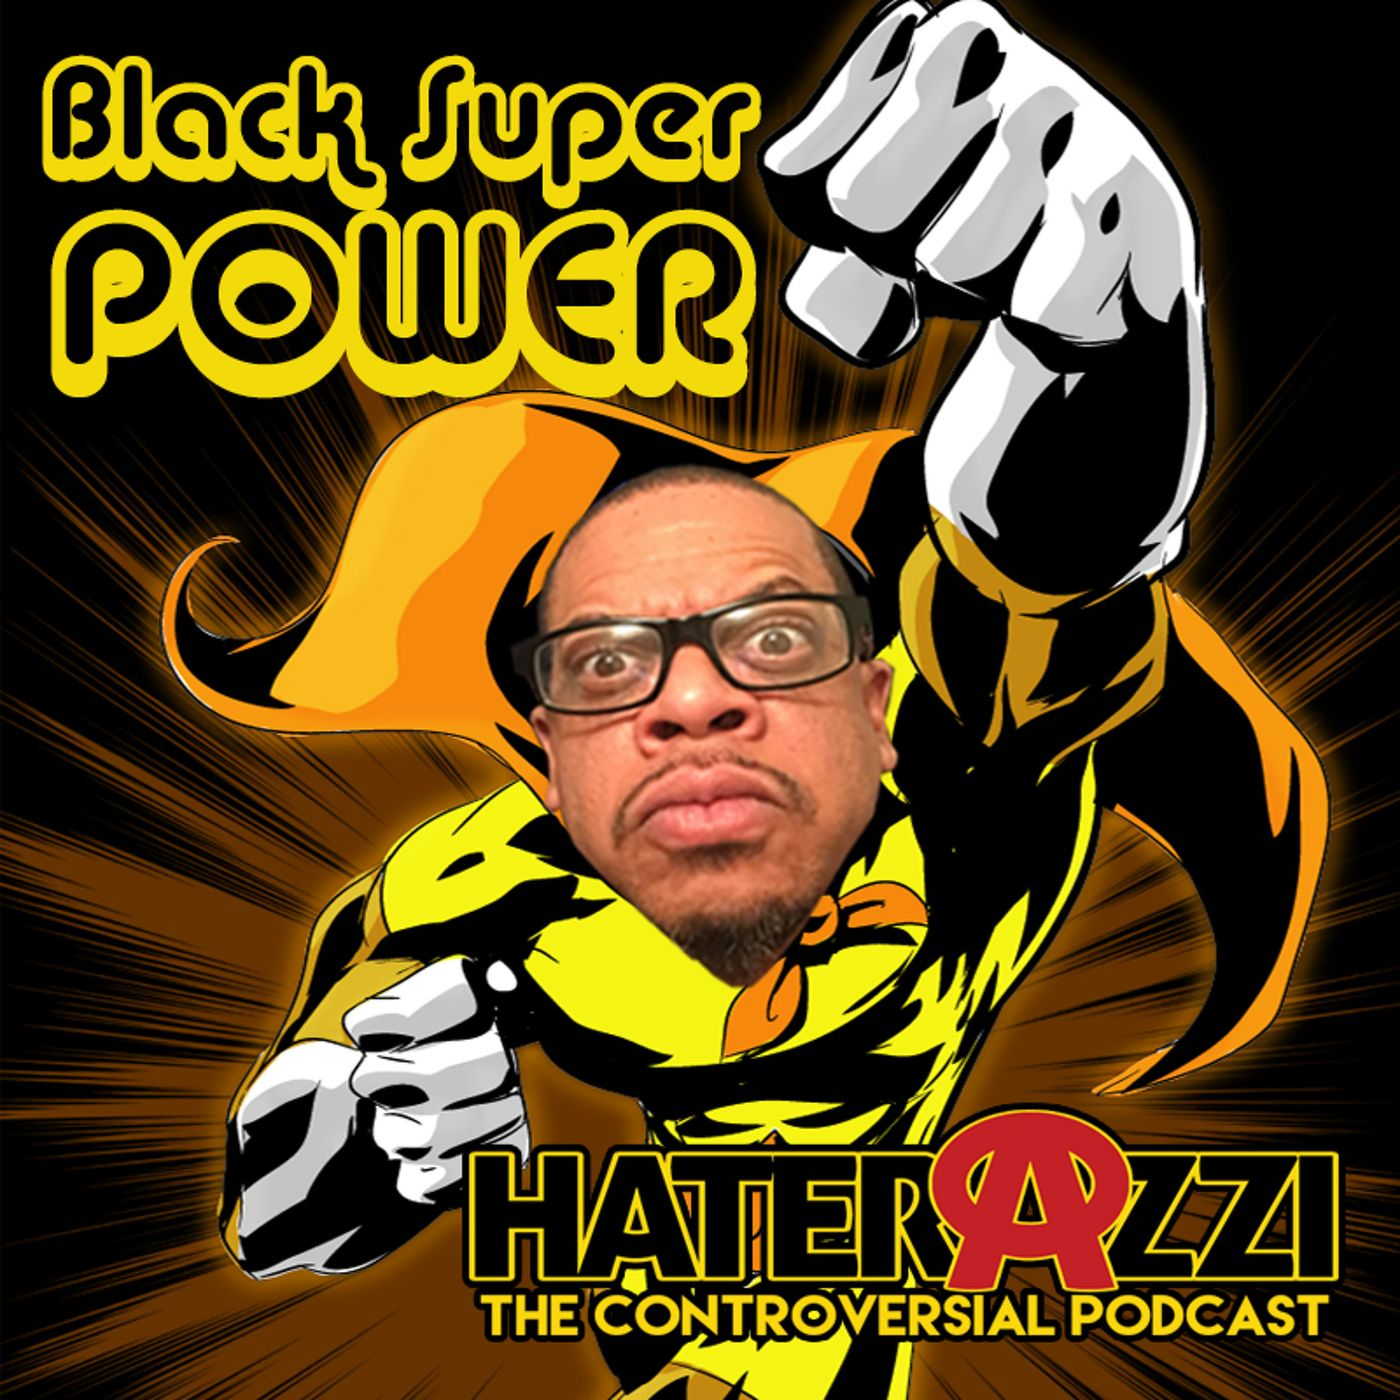 Black Super Power